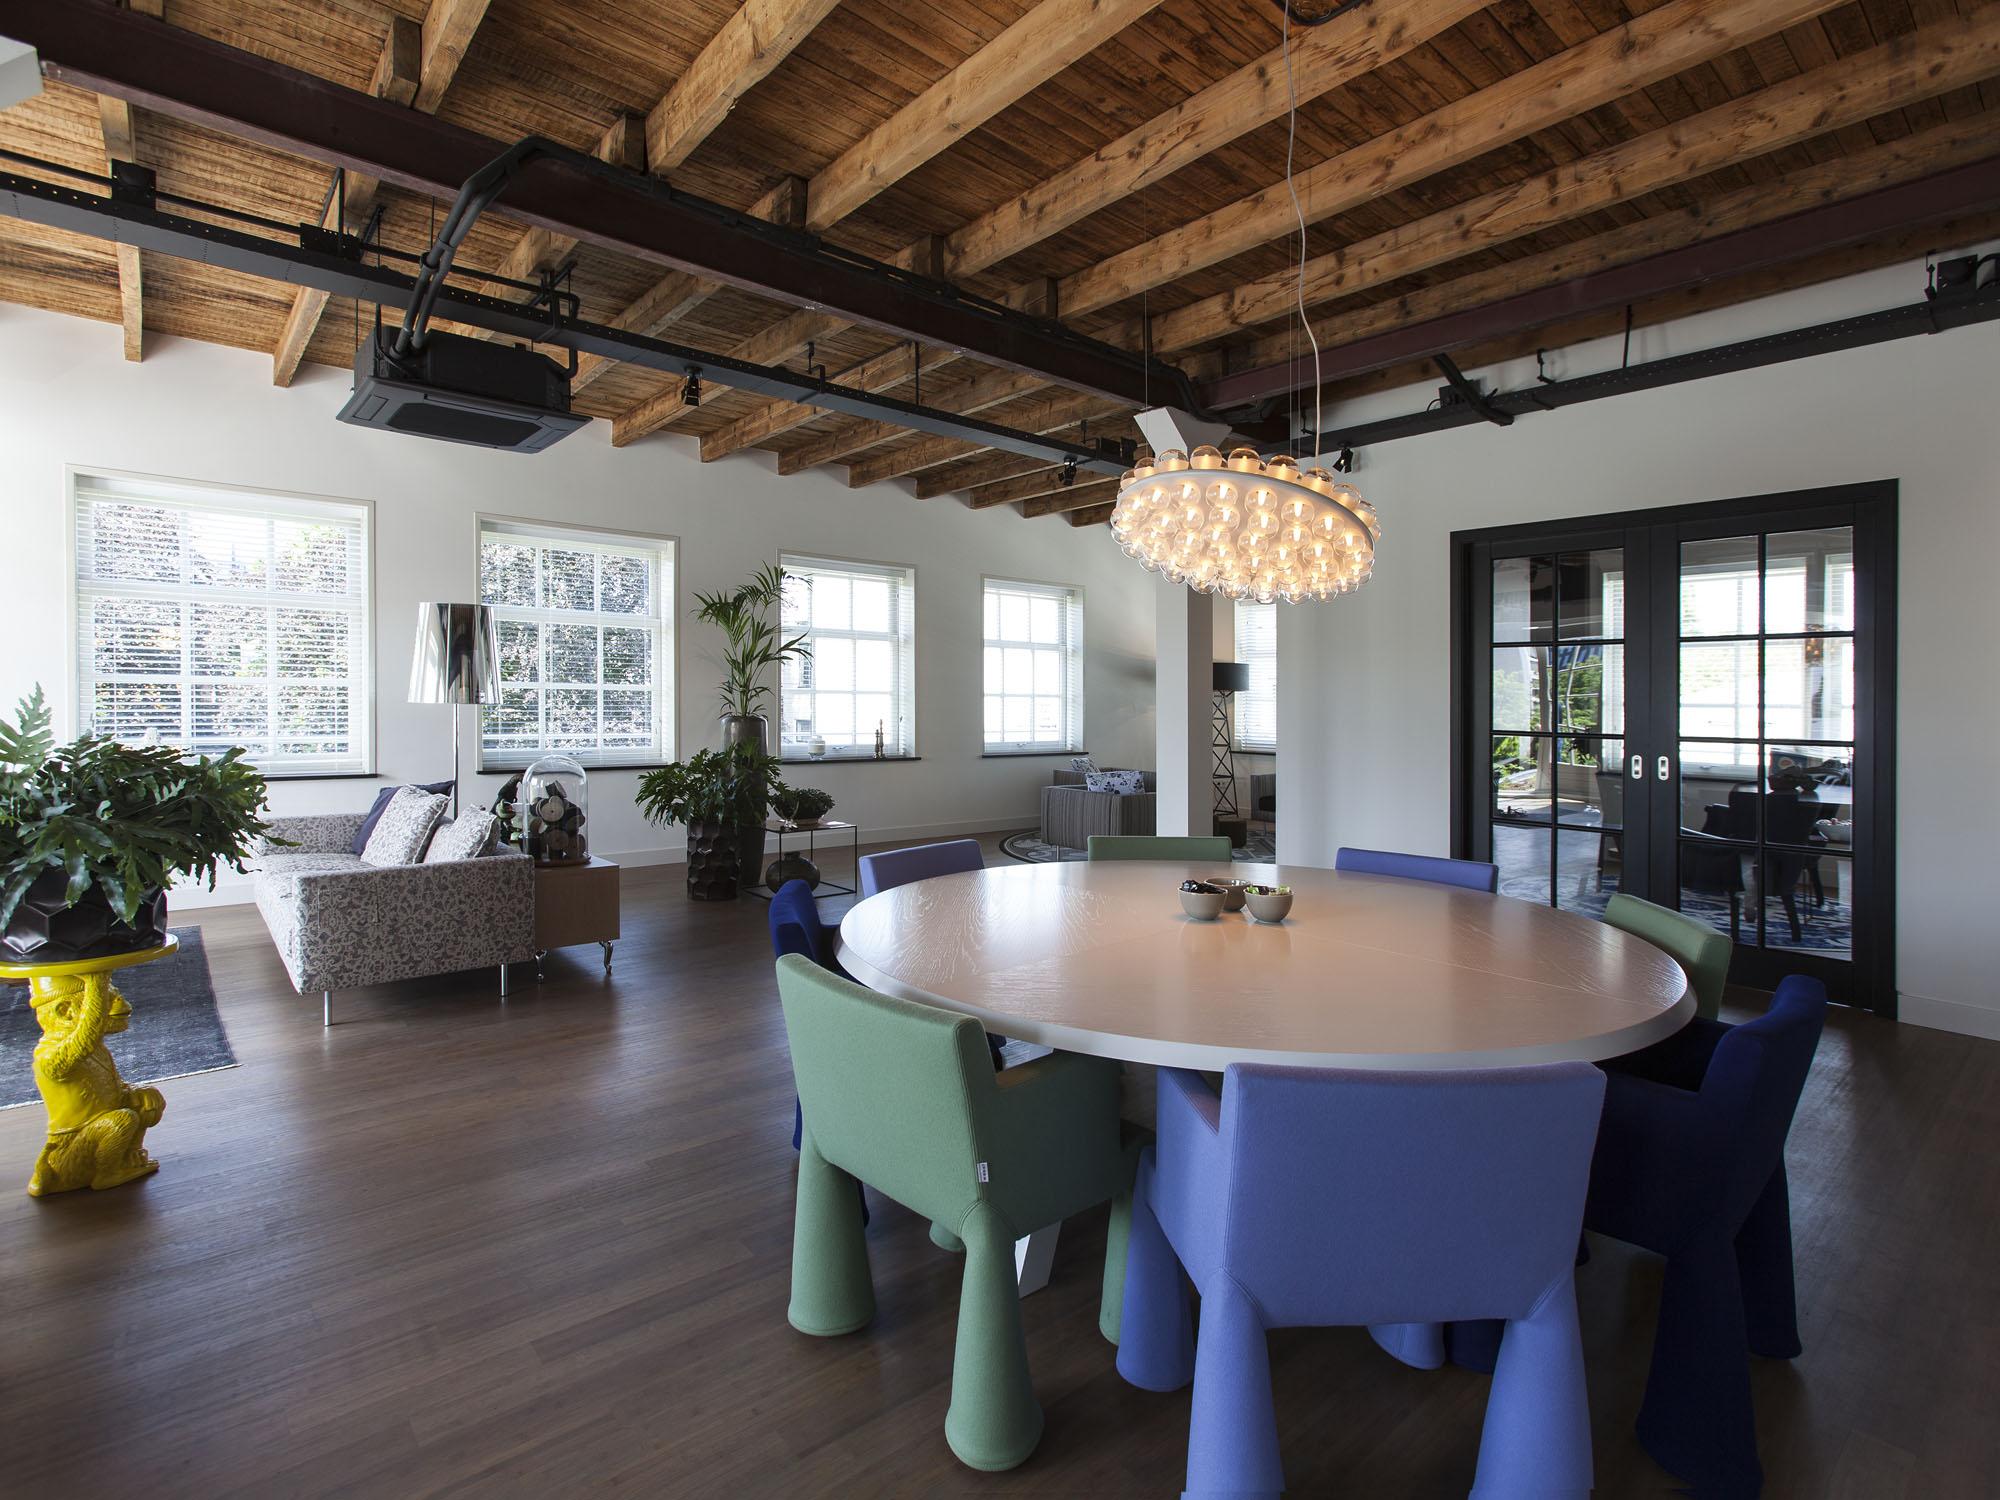 studio-hermanides-loft-office-6.jpg